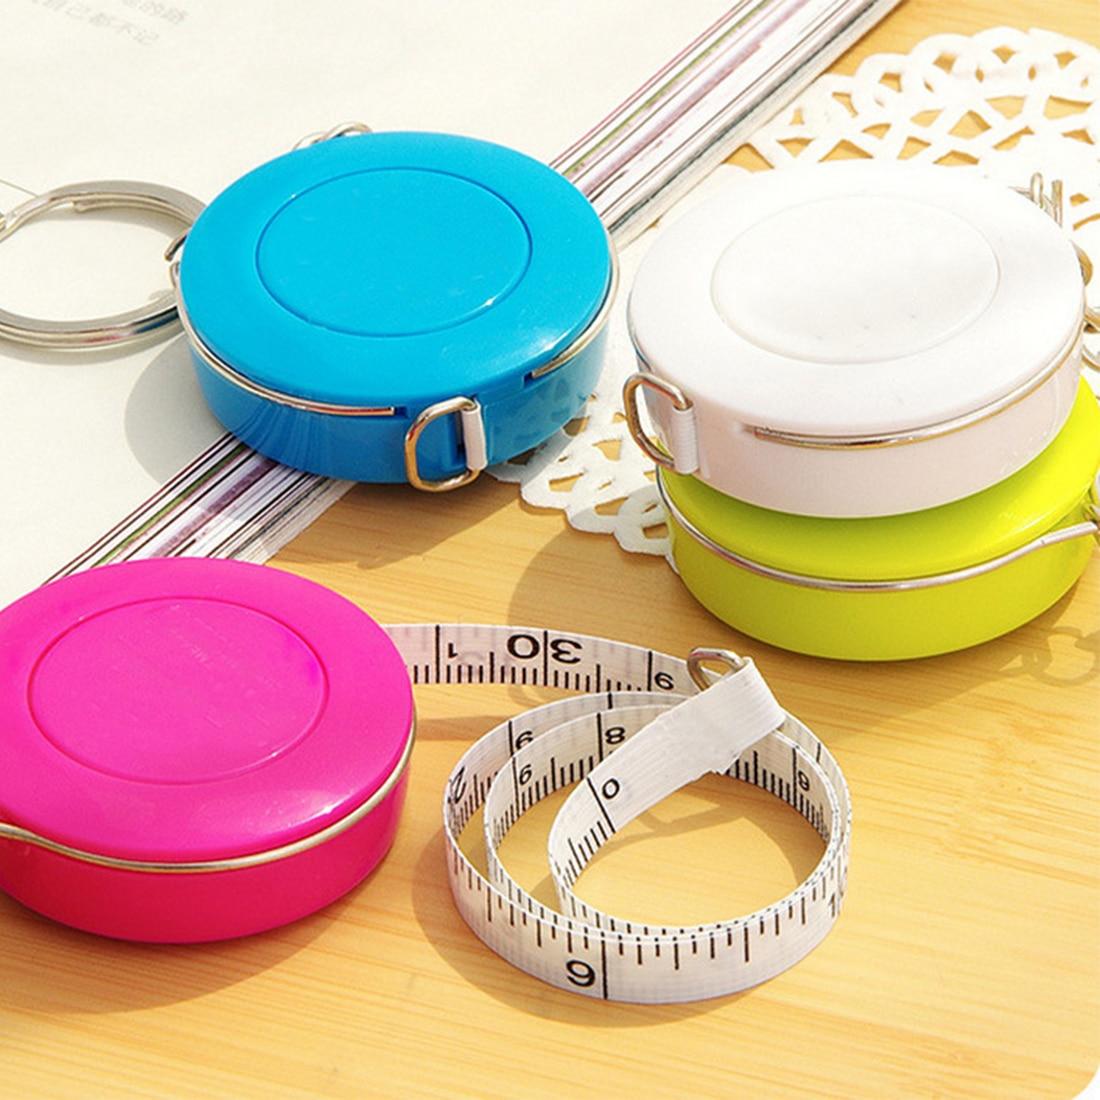 Mini Portable Tape Measure 1.5m Retractable Ruler Centimeter/inch Small Tape Measure Ruler Candy Color Cute Design For Travel